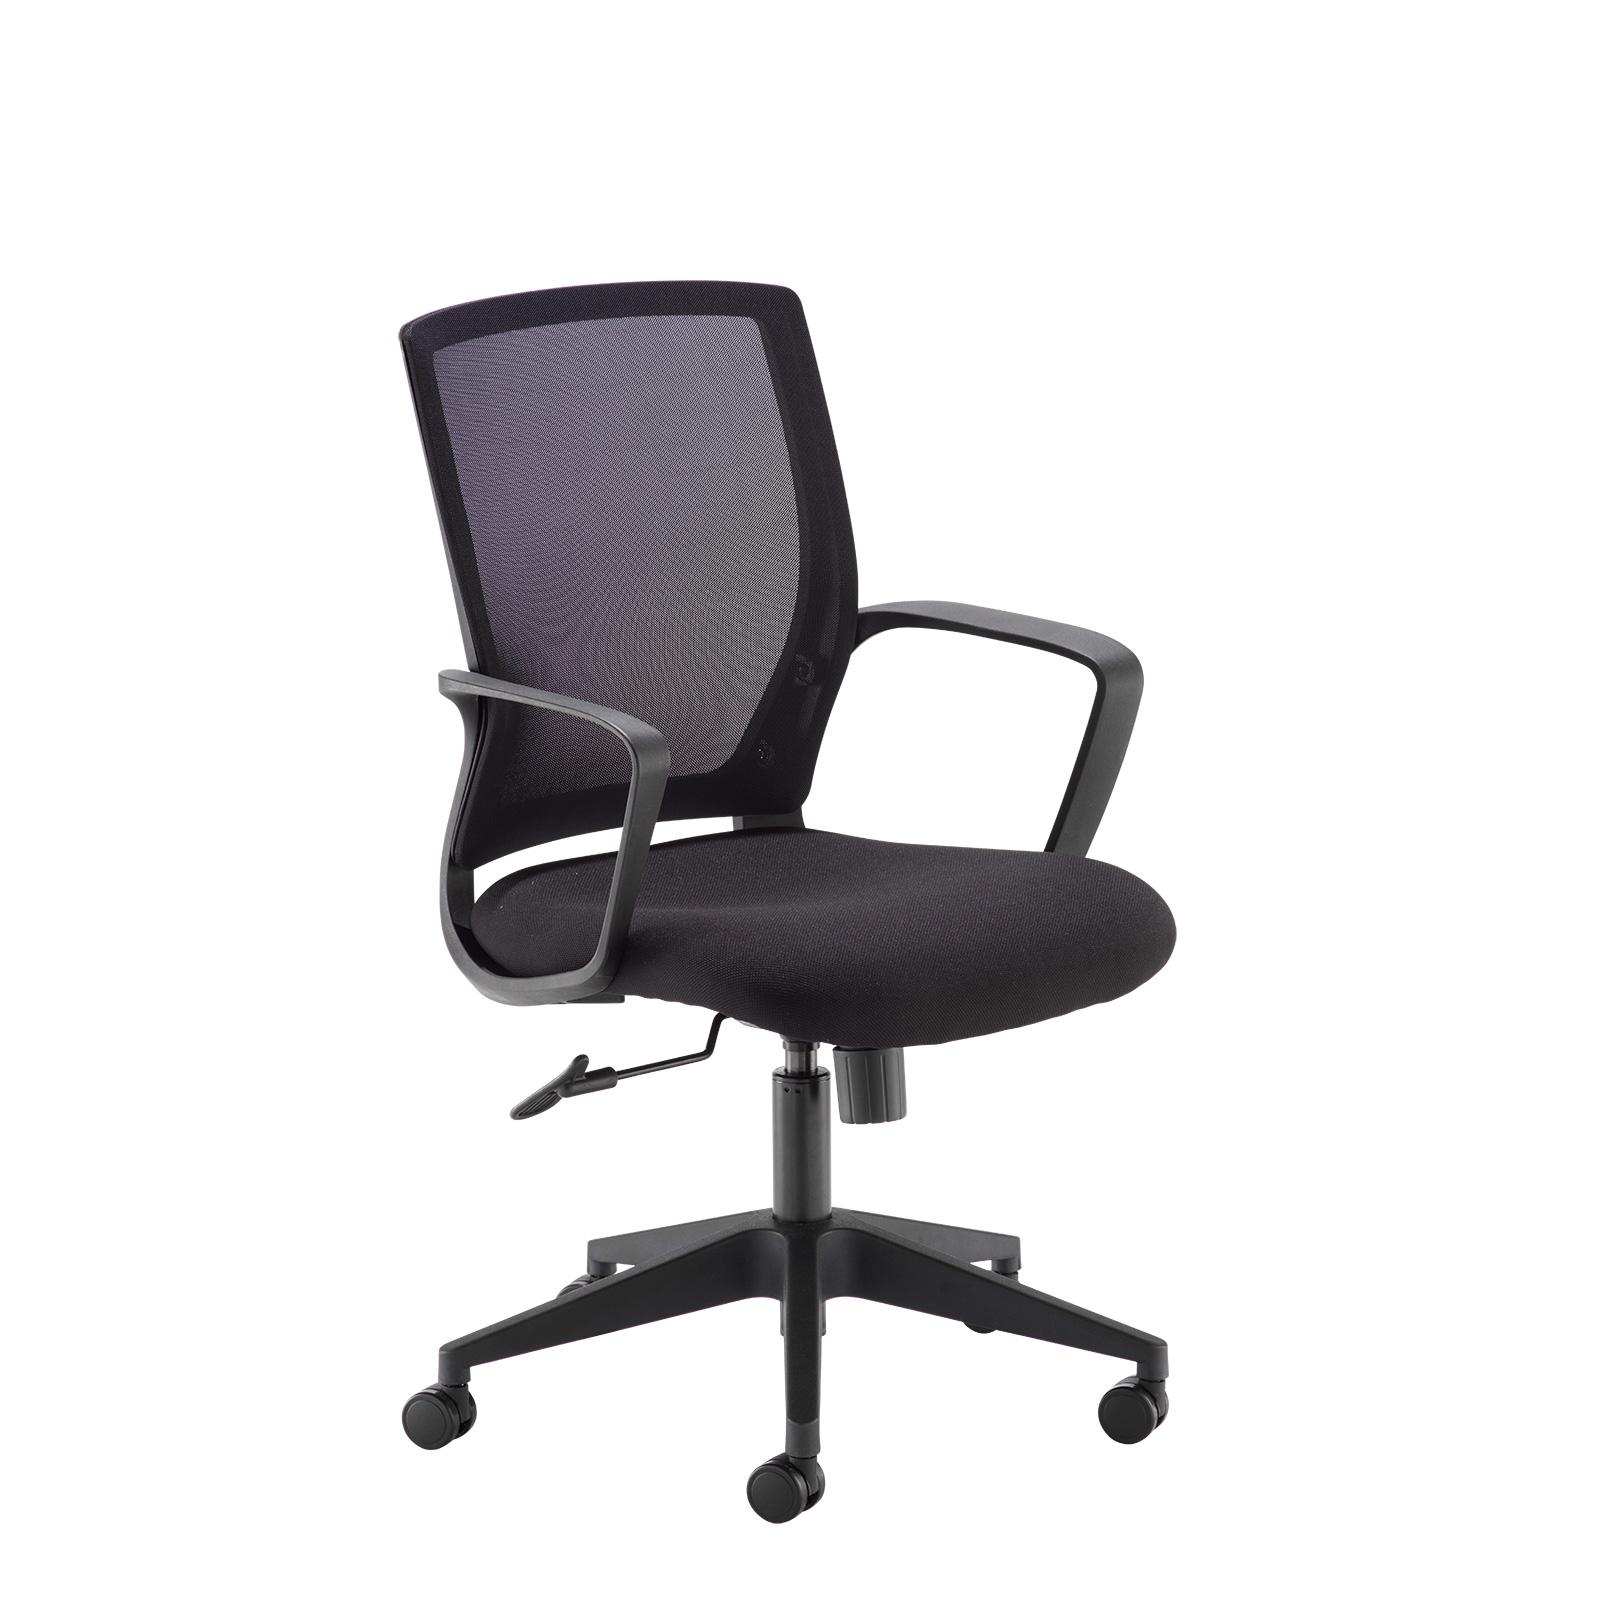 Desks Jonas black mesh back operator chair with black fabric seat and black base